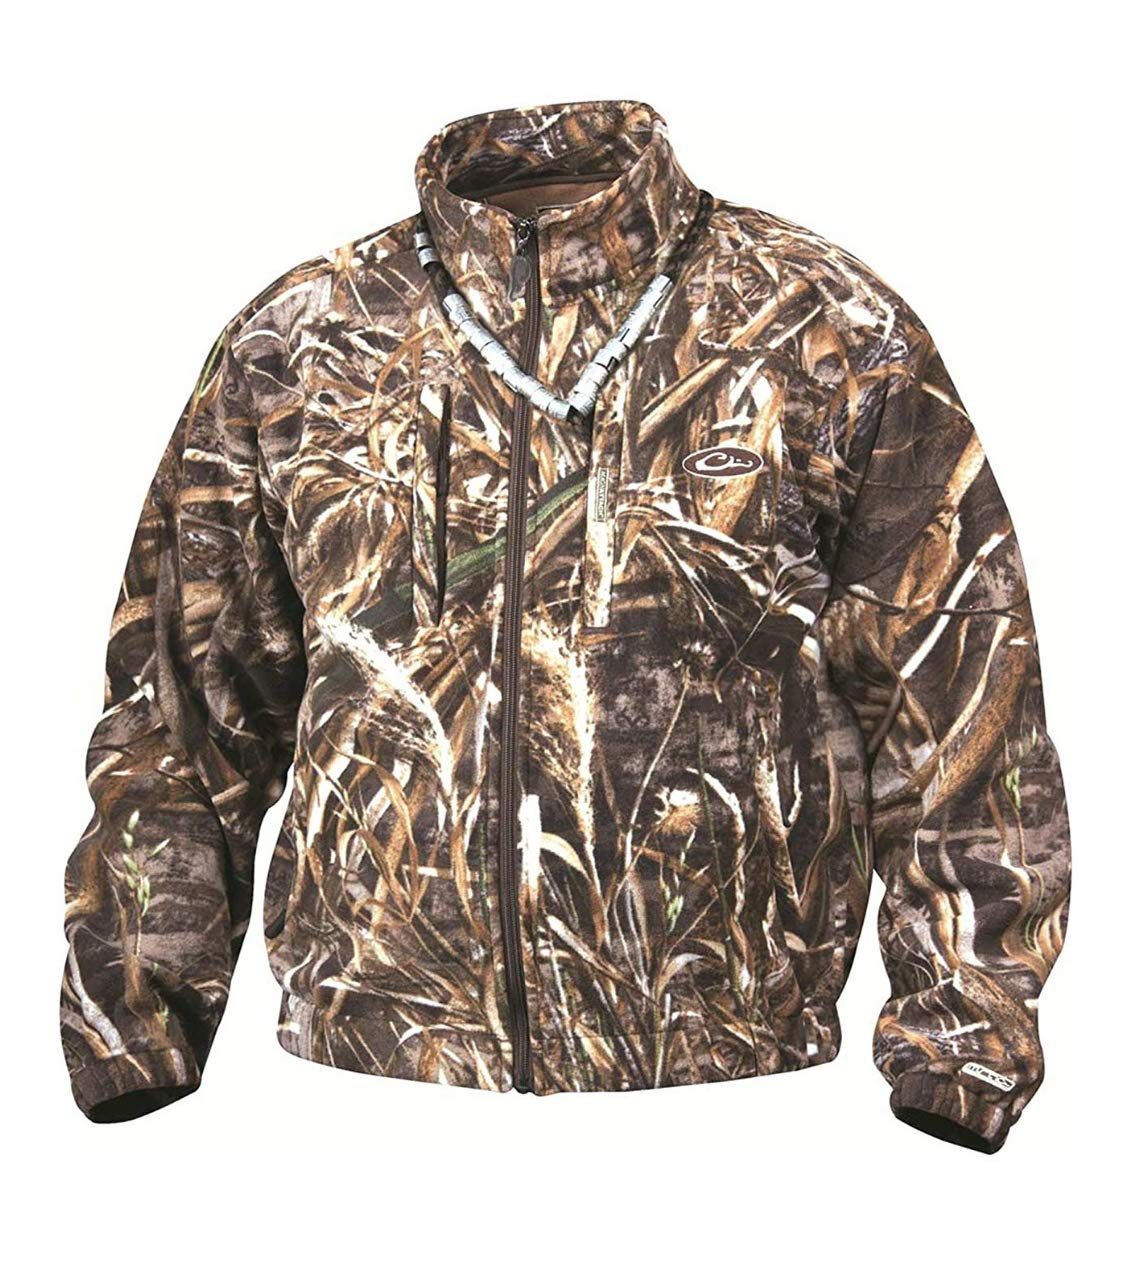 a698aee581e28 Amazon.com: Drake MST Layering Waterproof Fleece Full Zip Jacket Max 5 Camo  DW215: Sports & Outdoors